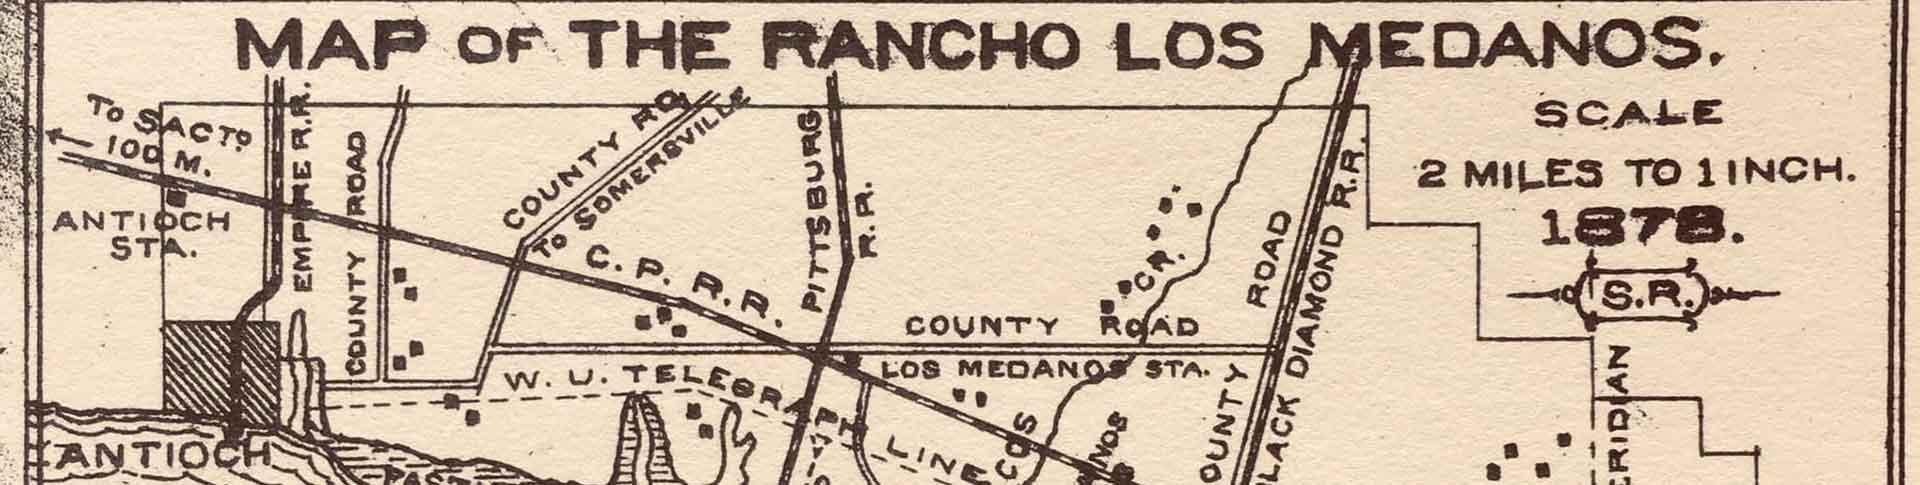 Map of Rancho Los Medanos in 1878 Pittsburg California